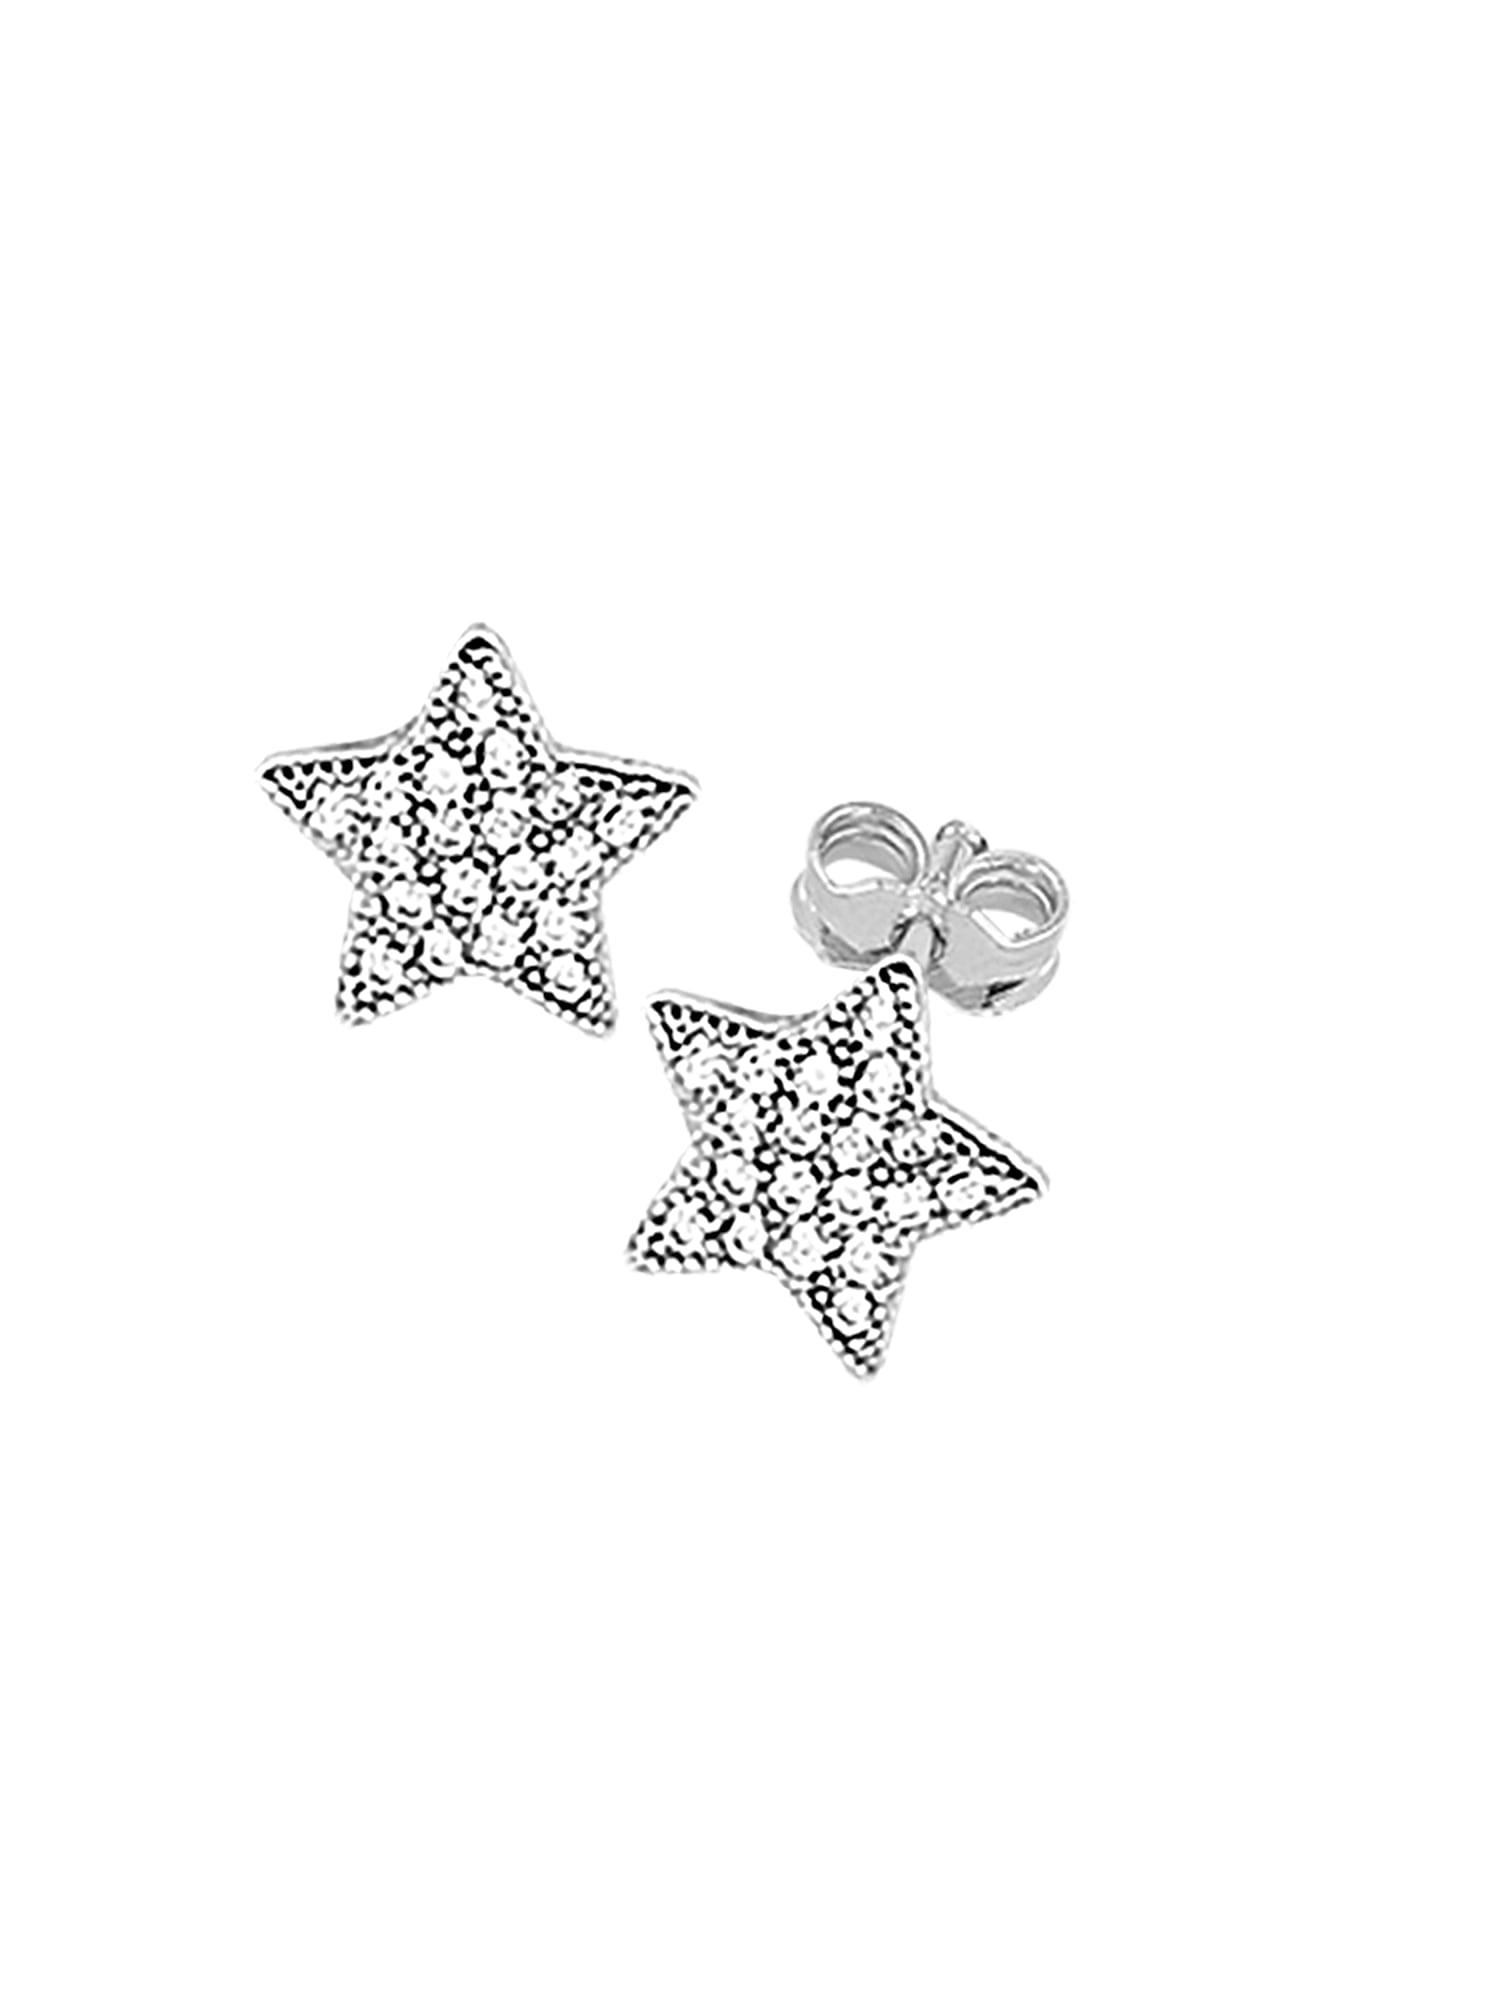 Náušnice WISHING ON A STAR stříbrná SO COSI